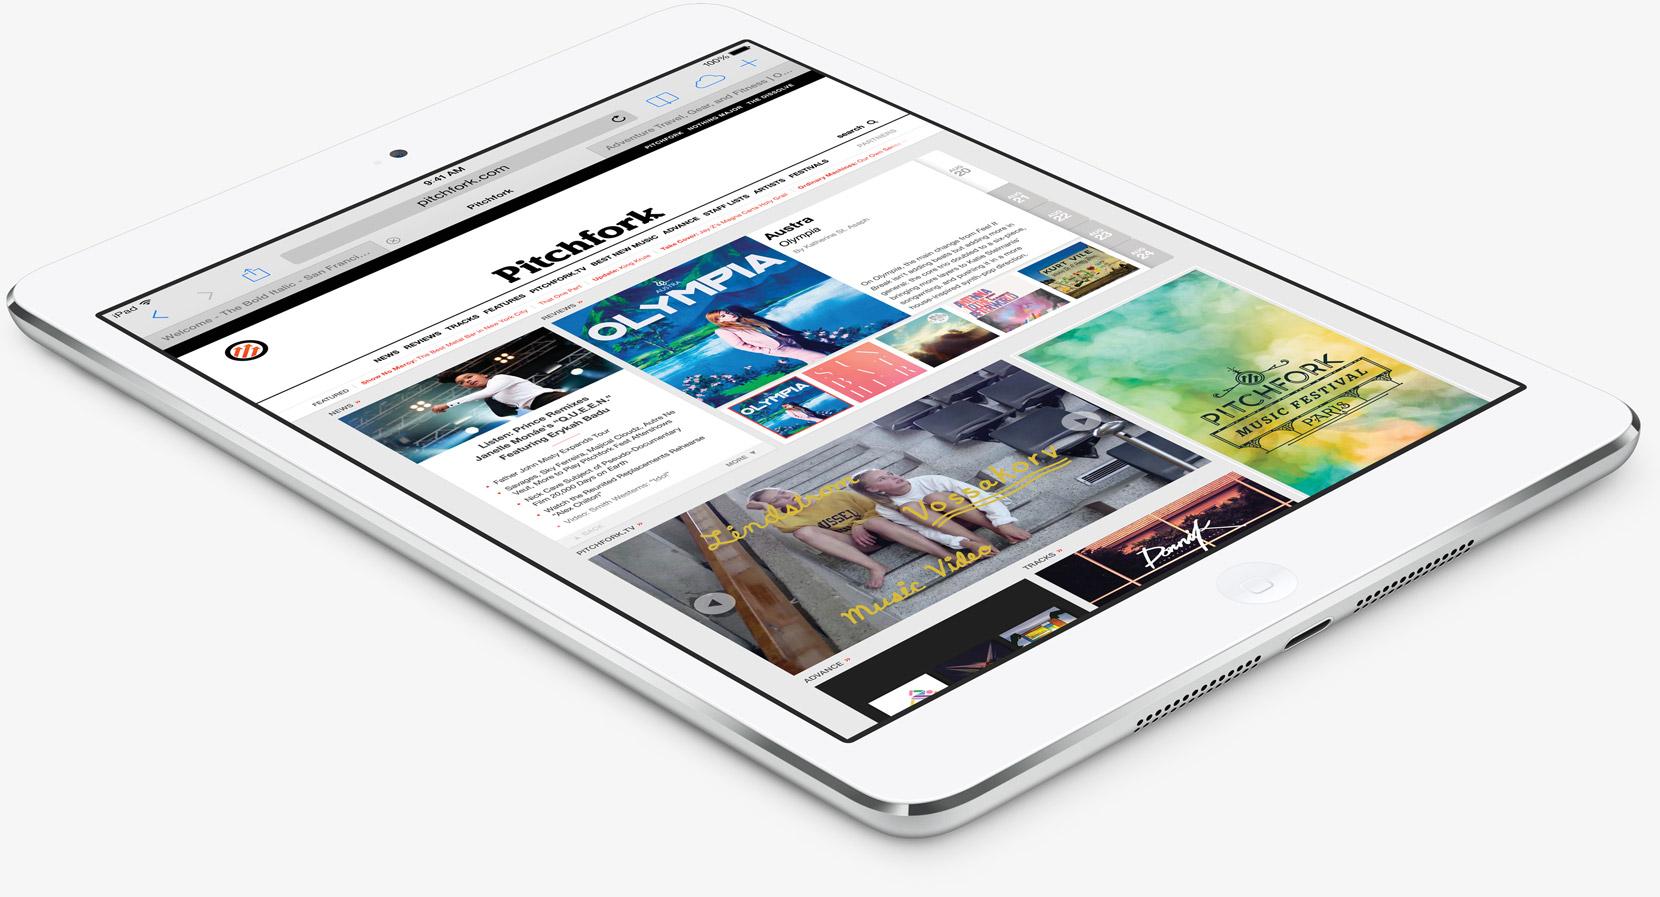 Экран iPad mini 4 — один из лучших среди планшетов Apple